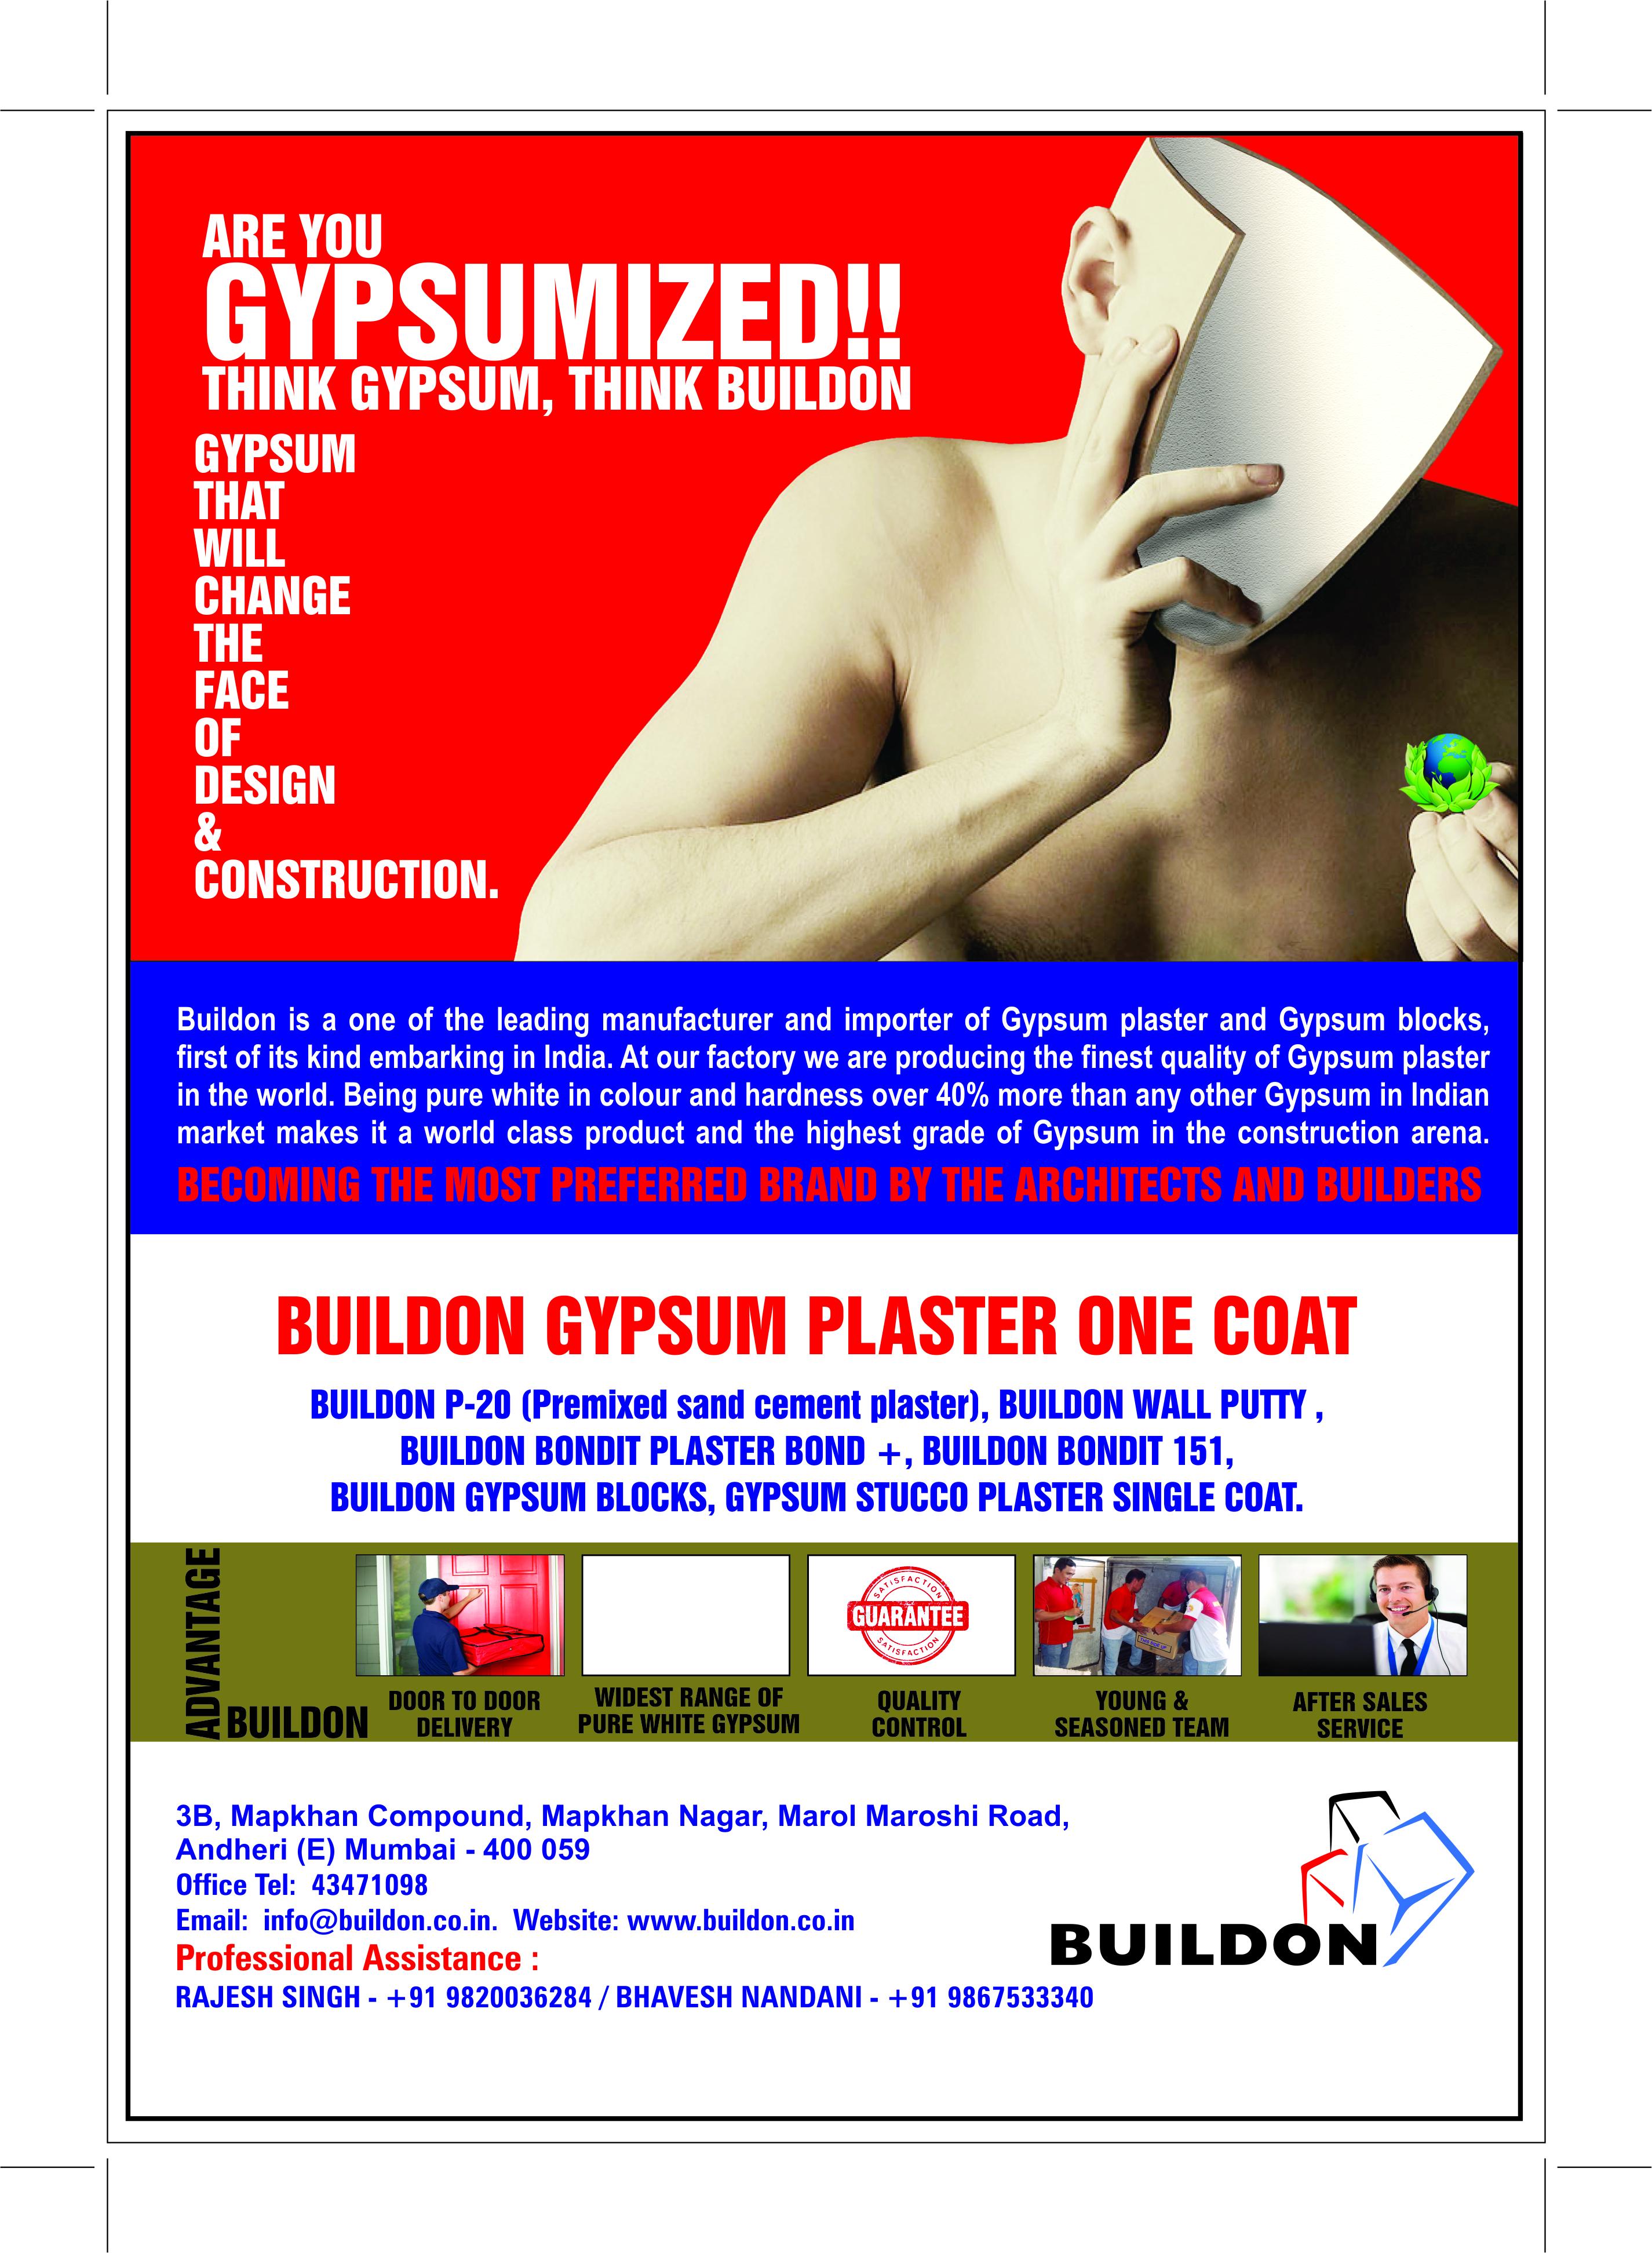 BUILDON GYPSUM